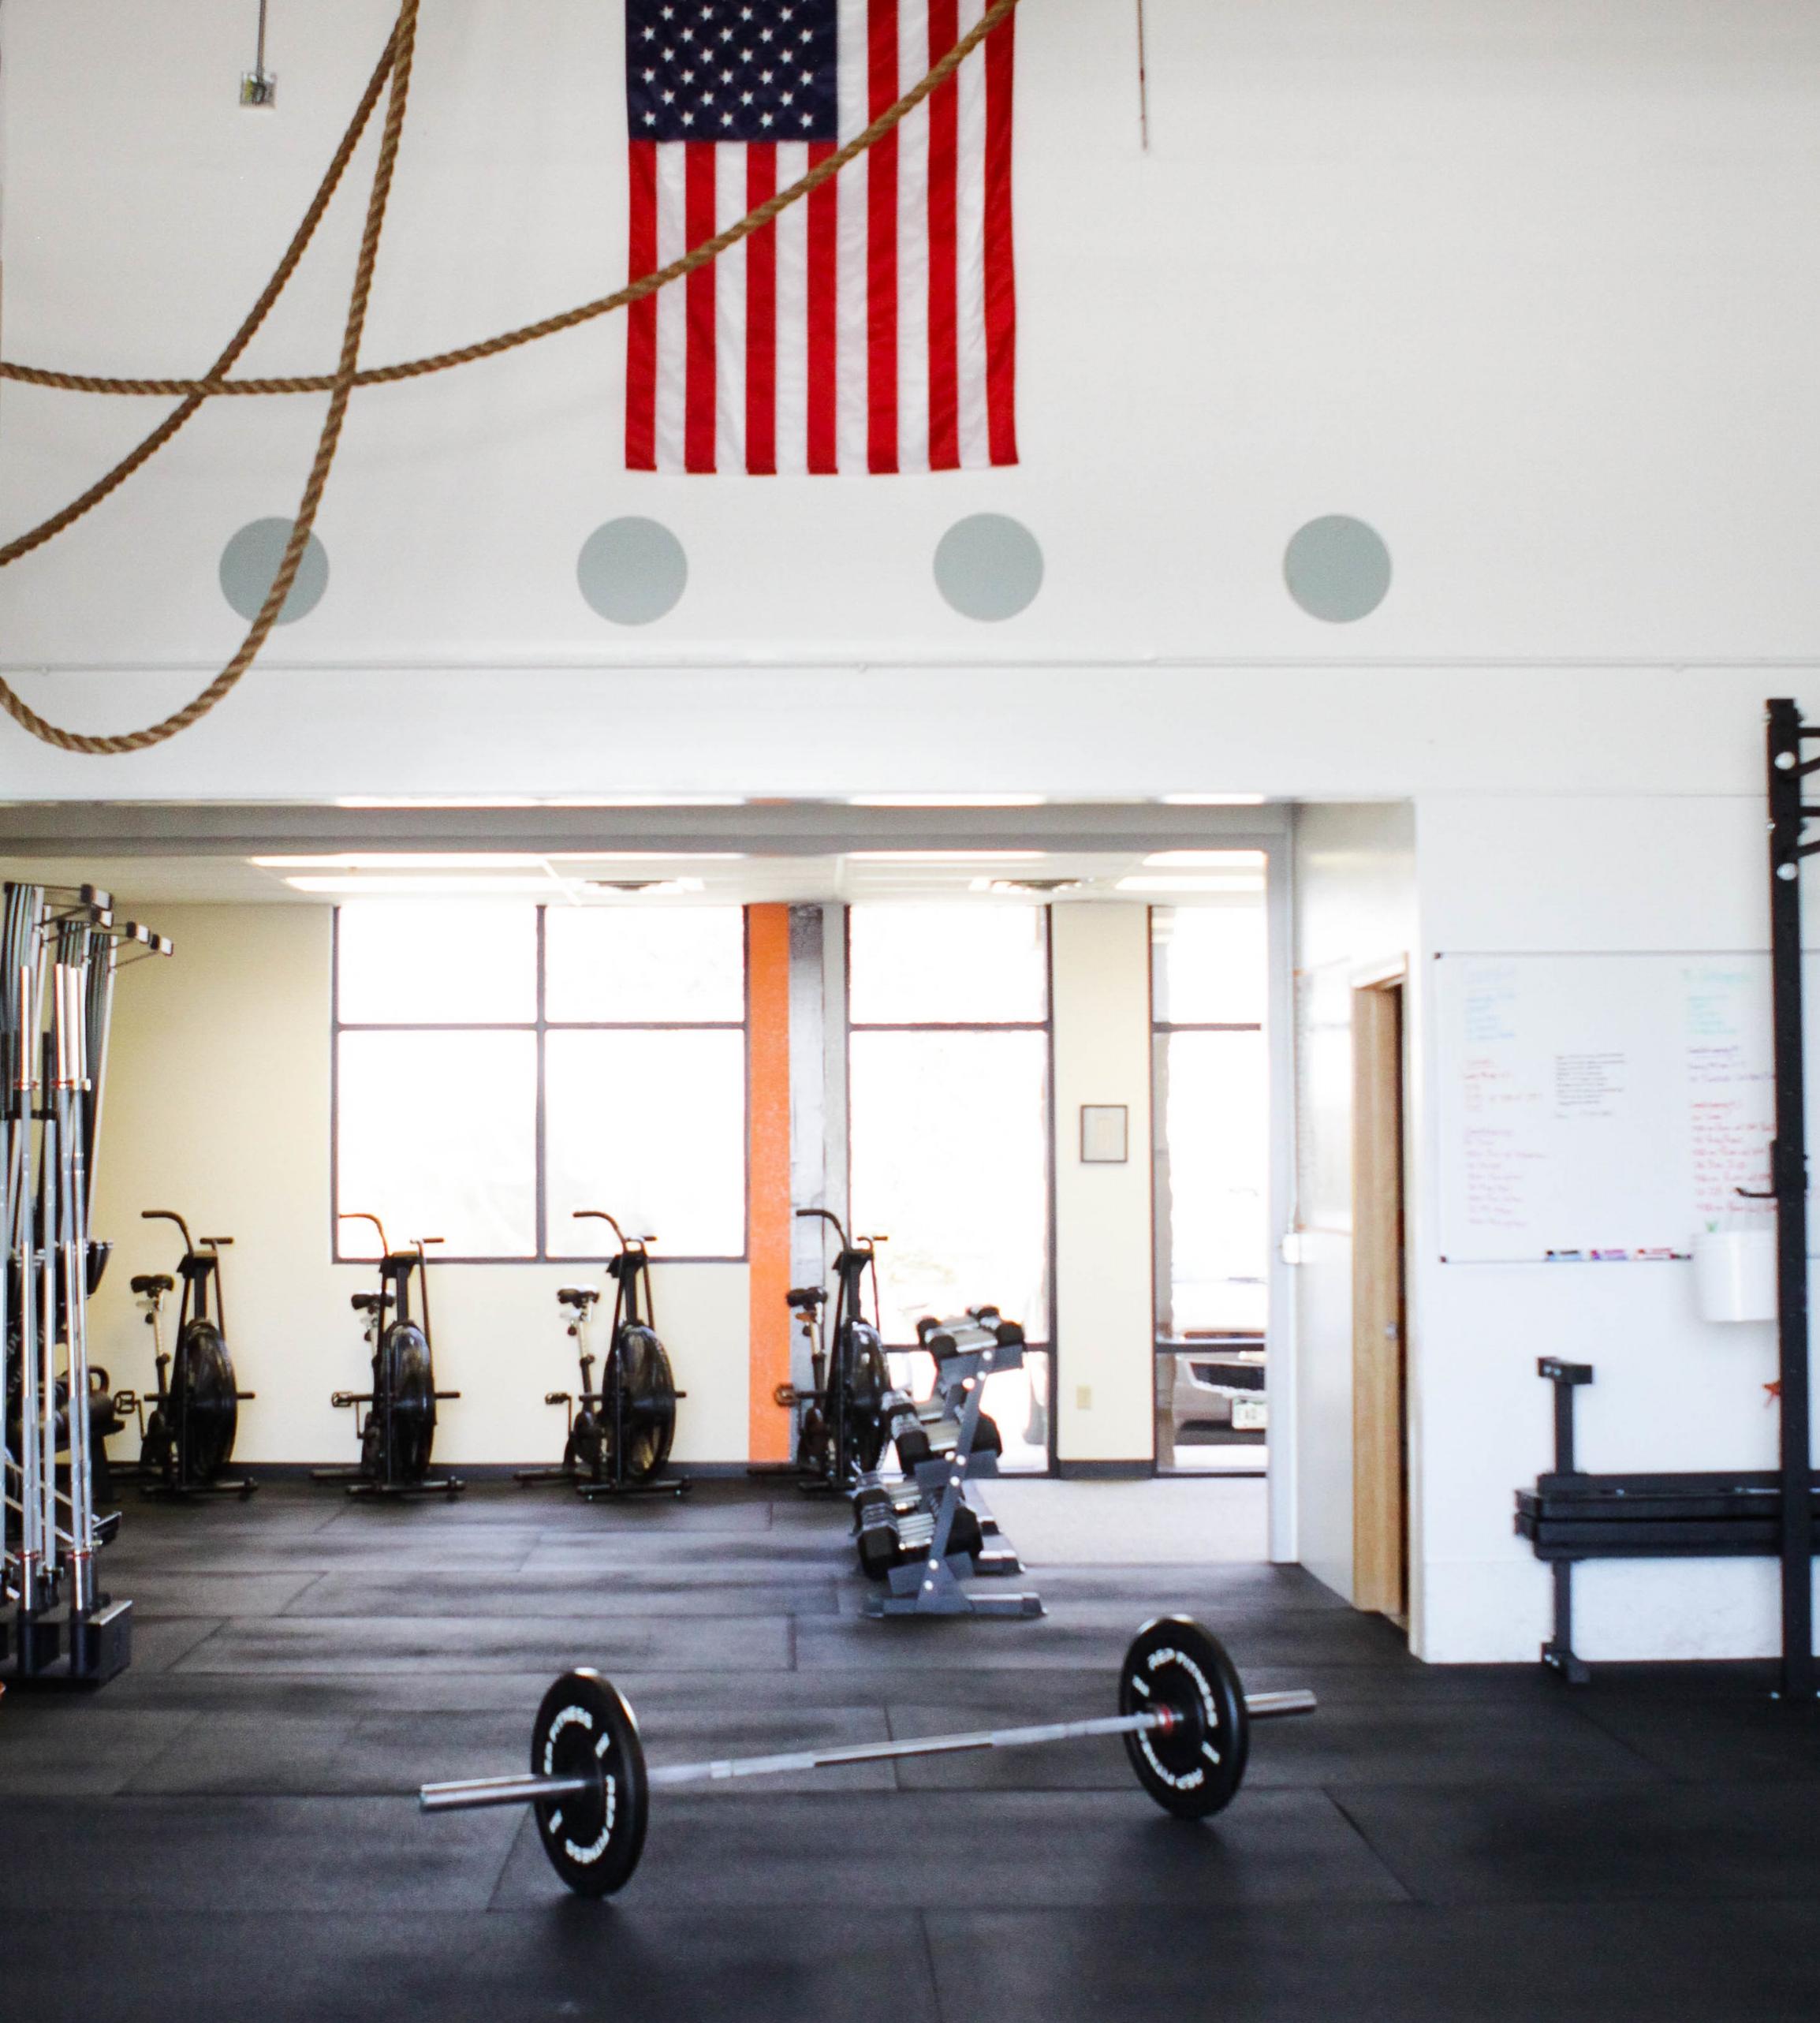 Our Facility - 6886 N Franklin AveLoveland, CO 80538✆ 970-215-1526▸▸ stephanie@crossfit4982.com